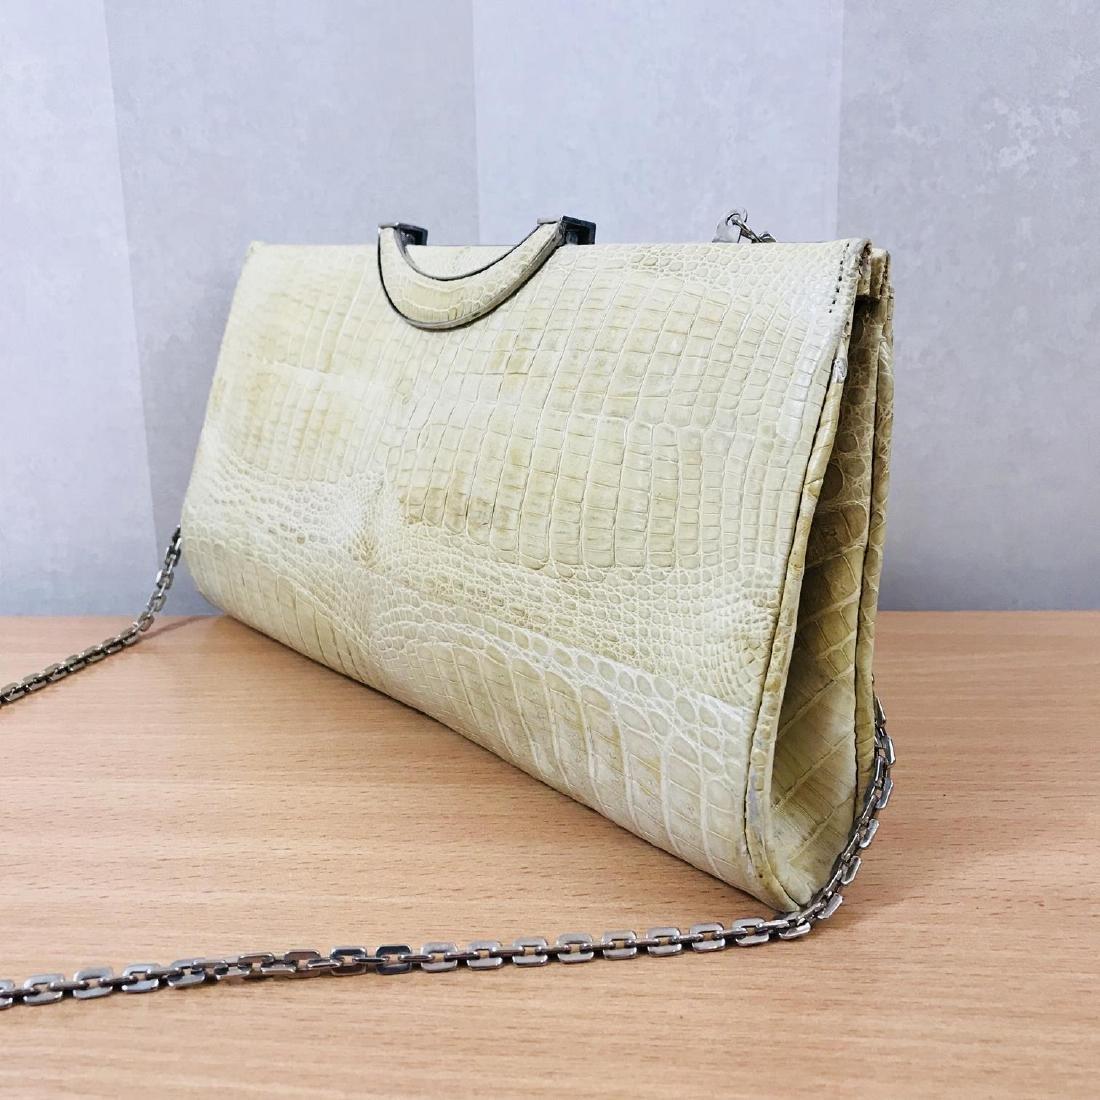 Vintage Beige Crocodile Leather Clutch Bag - 4